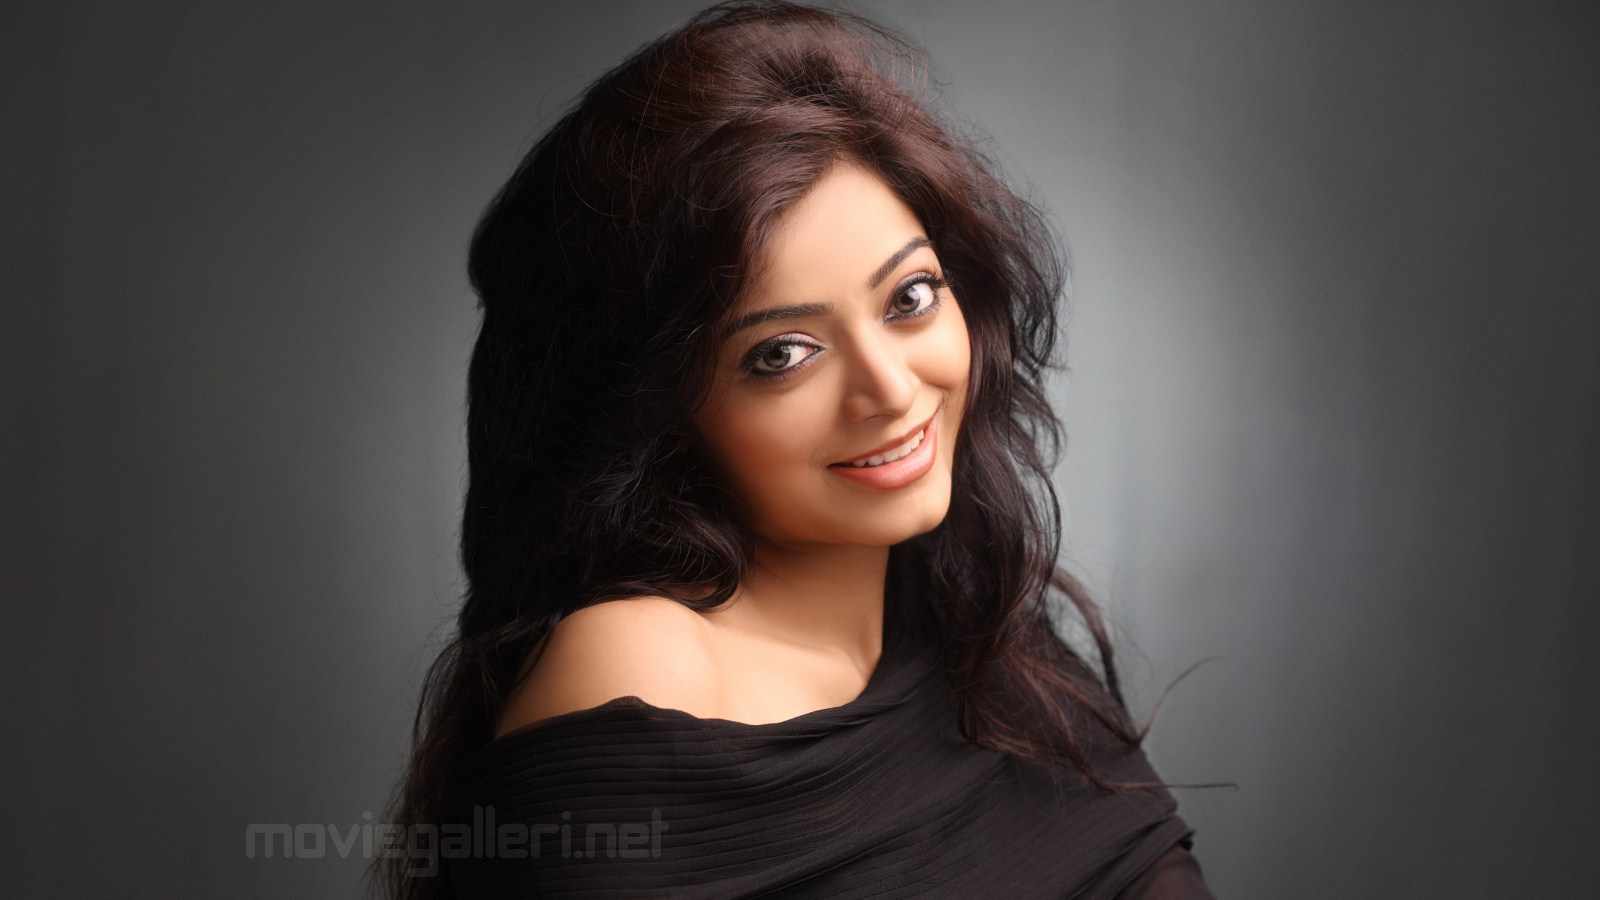 1366x768 Hd Tamil Actress Wallpapers Hazrat Musa Movie In Hindi